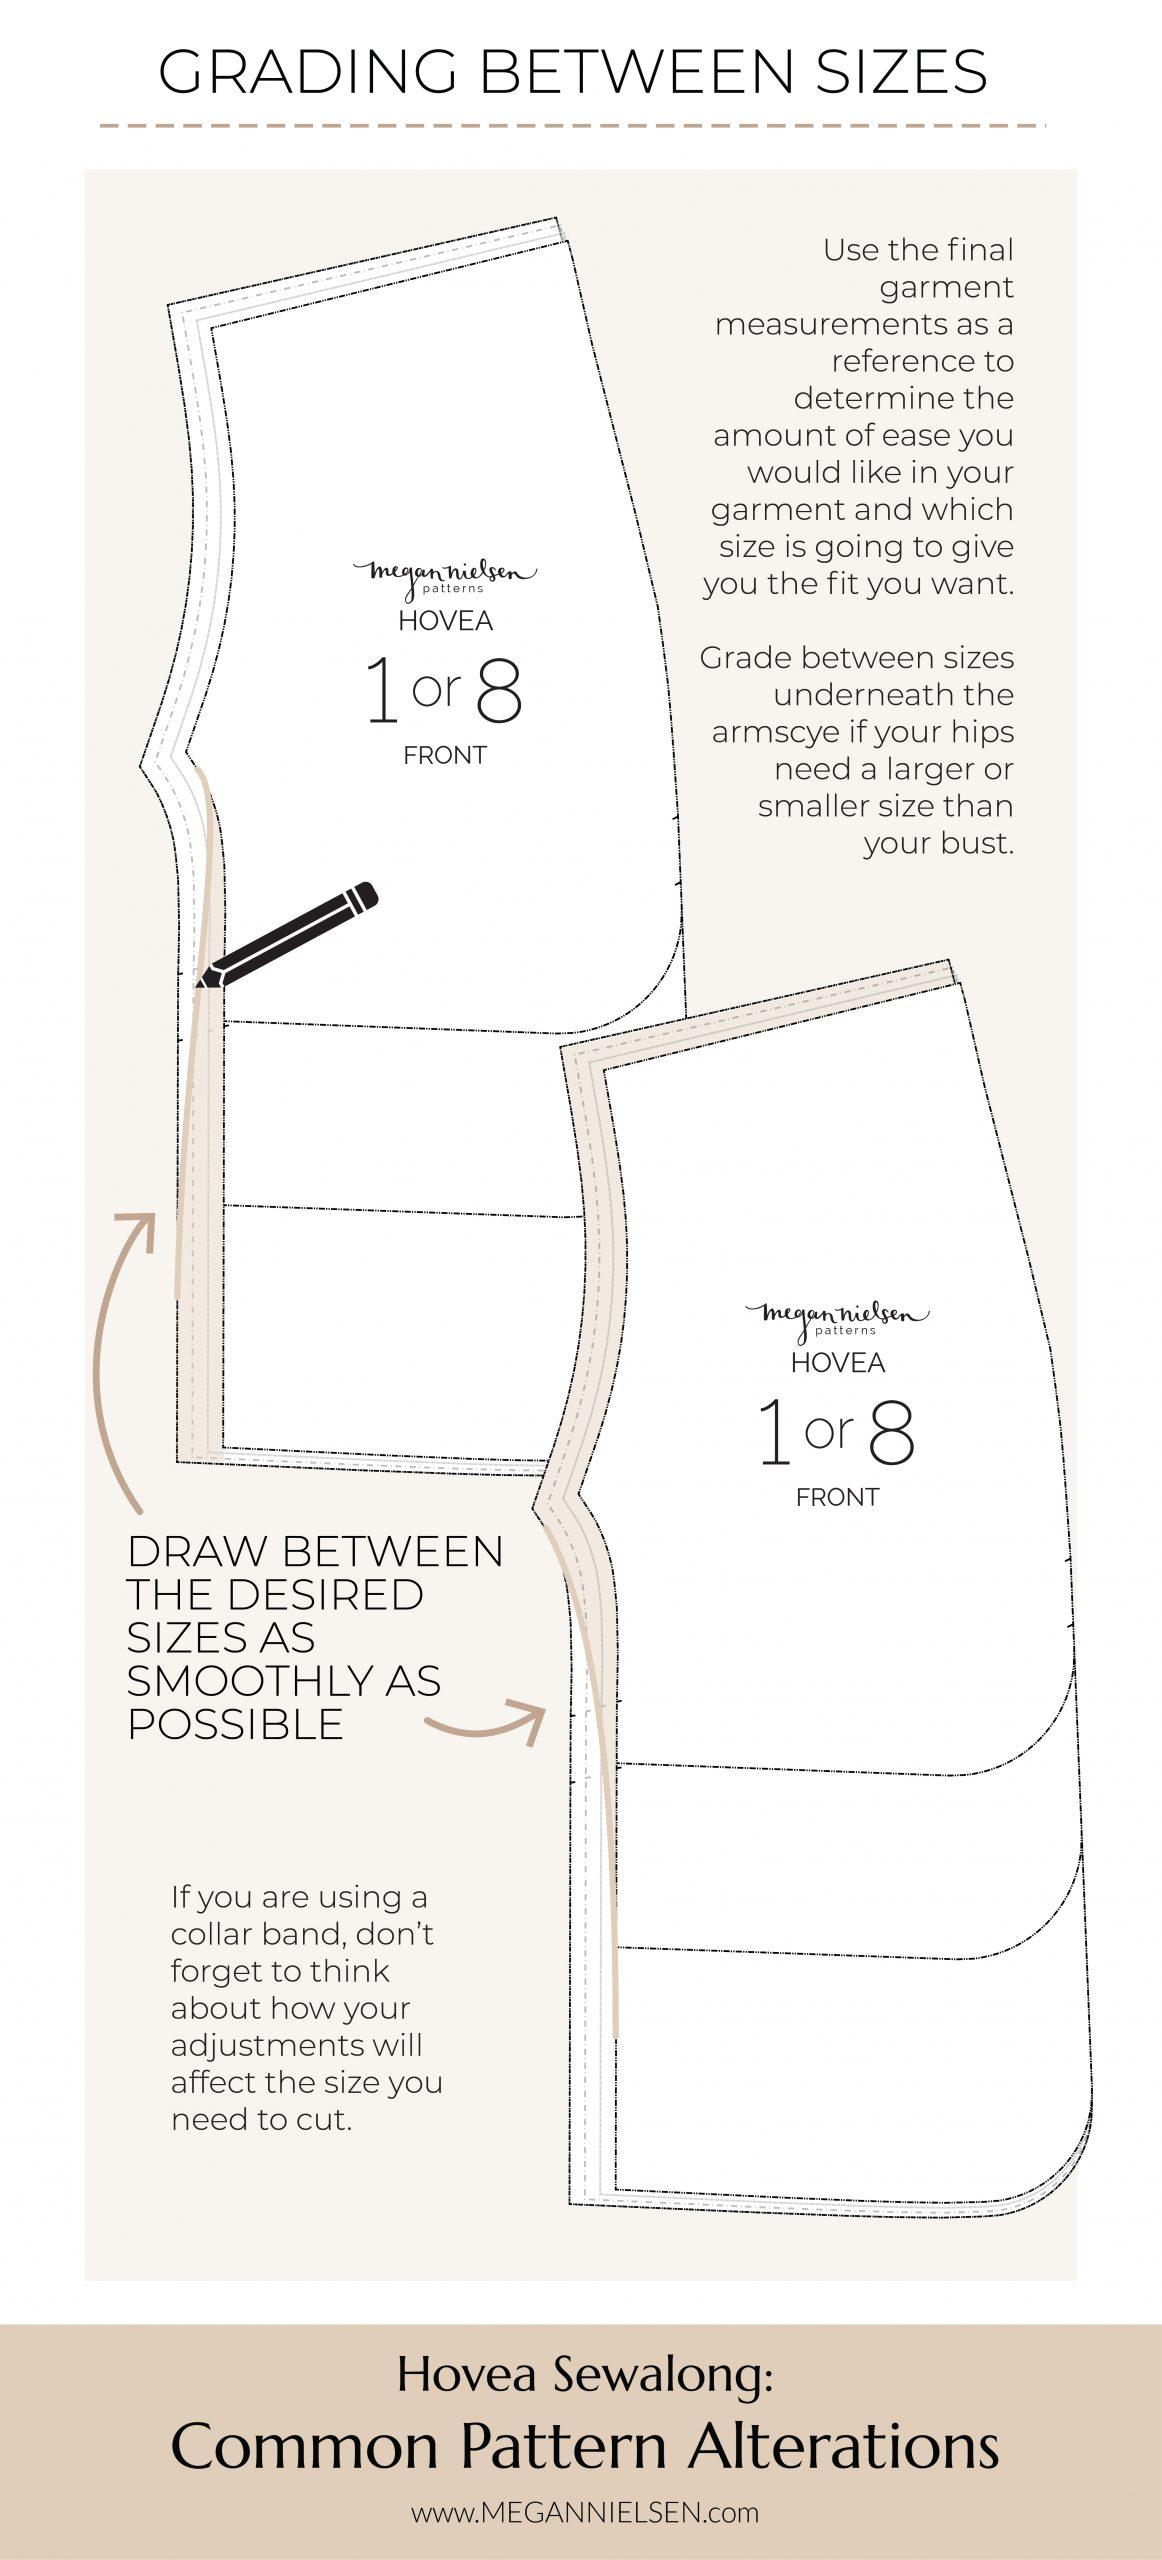 Megan Nielsen Patterns | Hovea Sewalong: Common Pattern Alterations | Grading Between Sizes